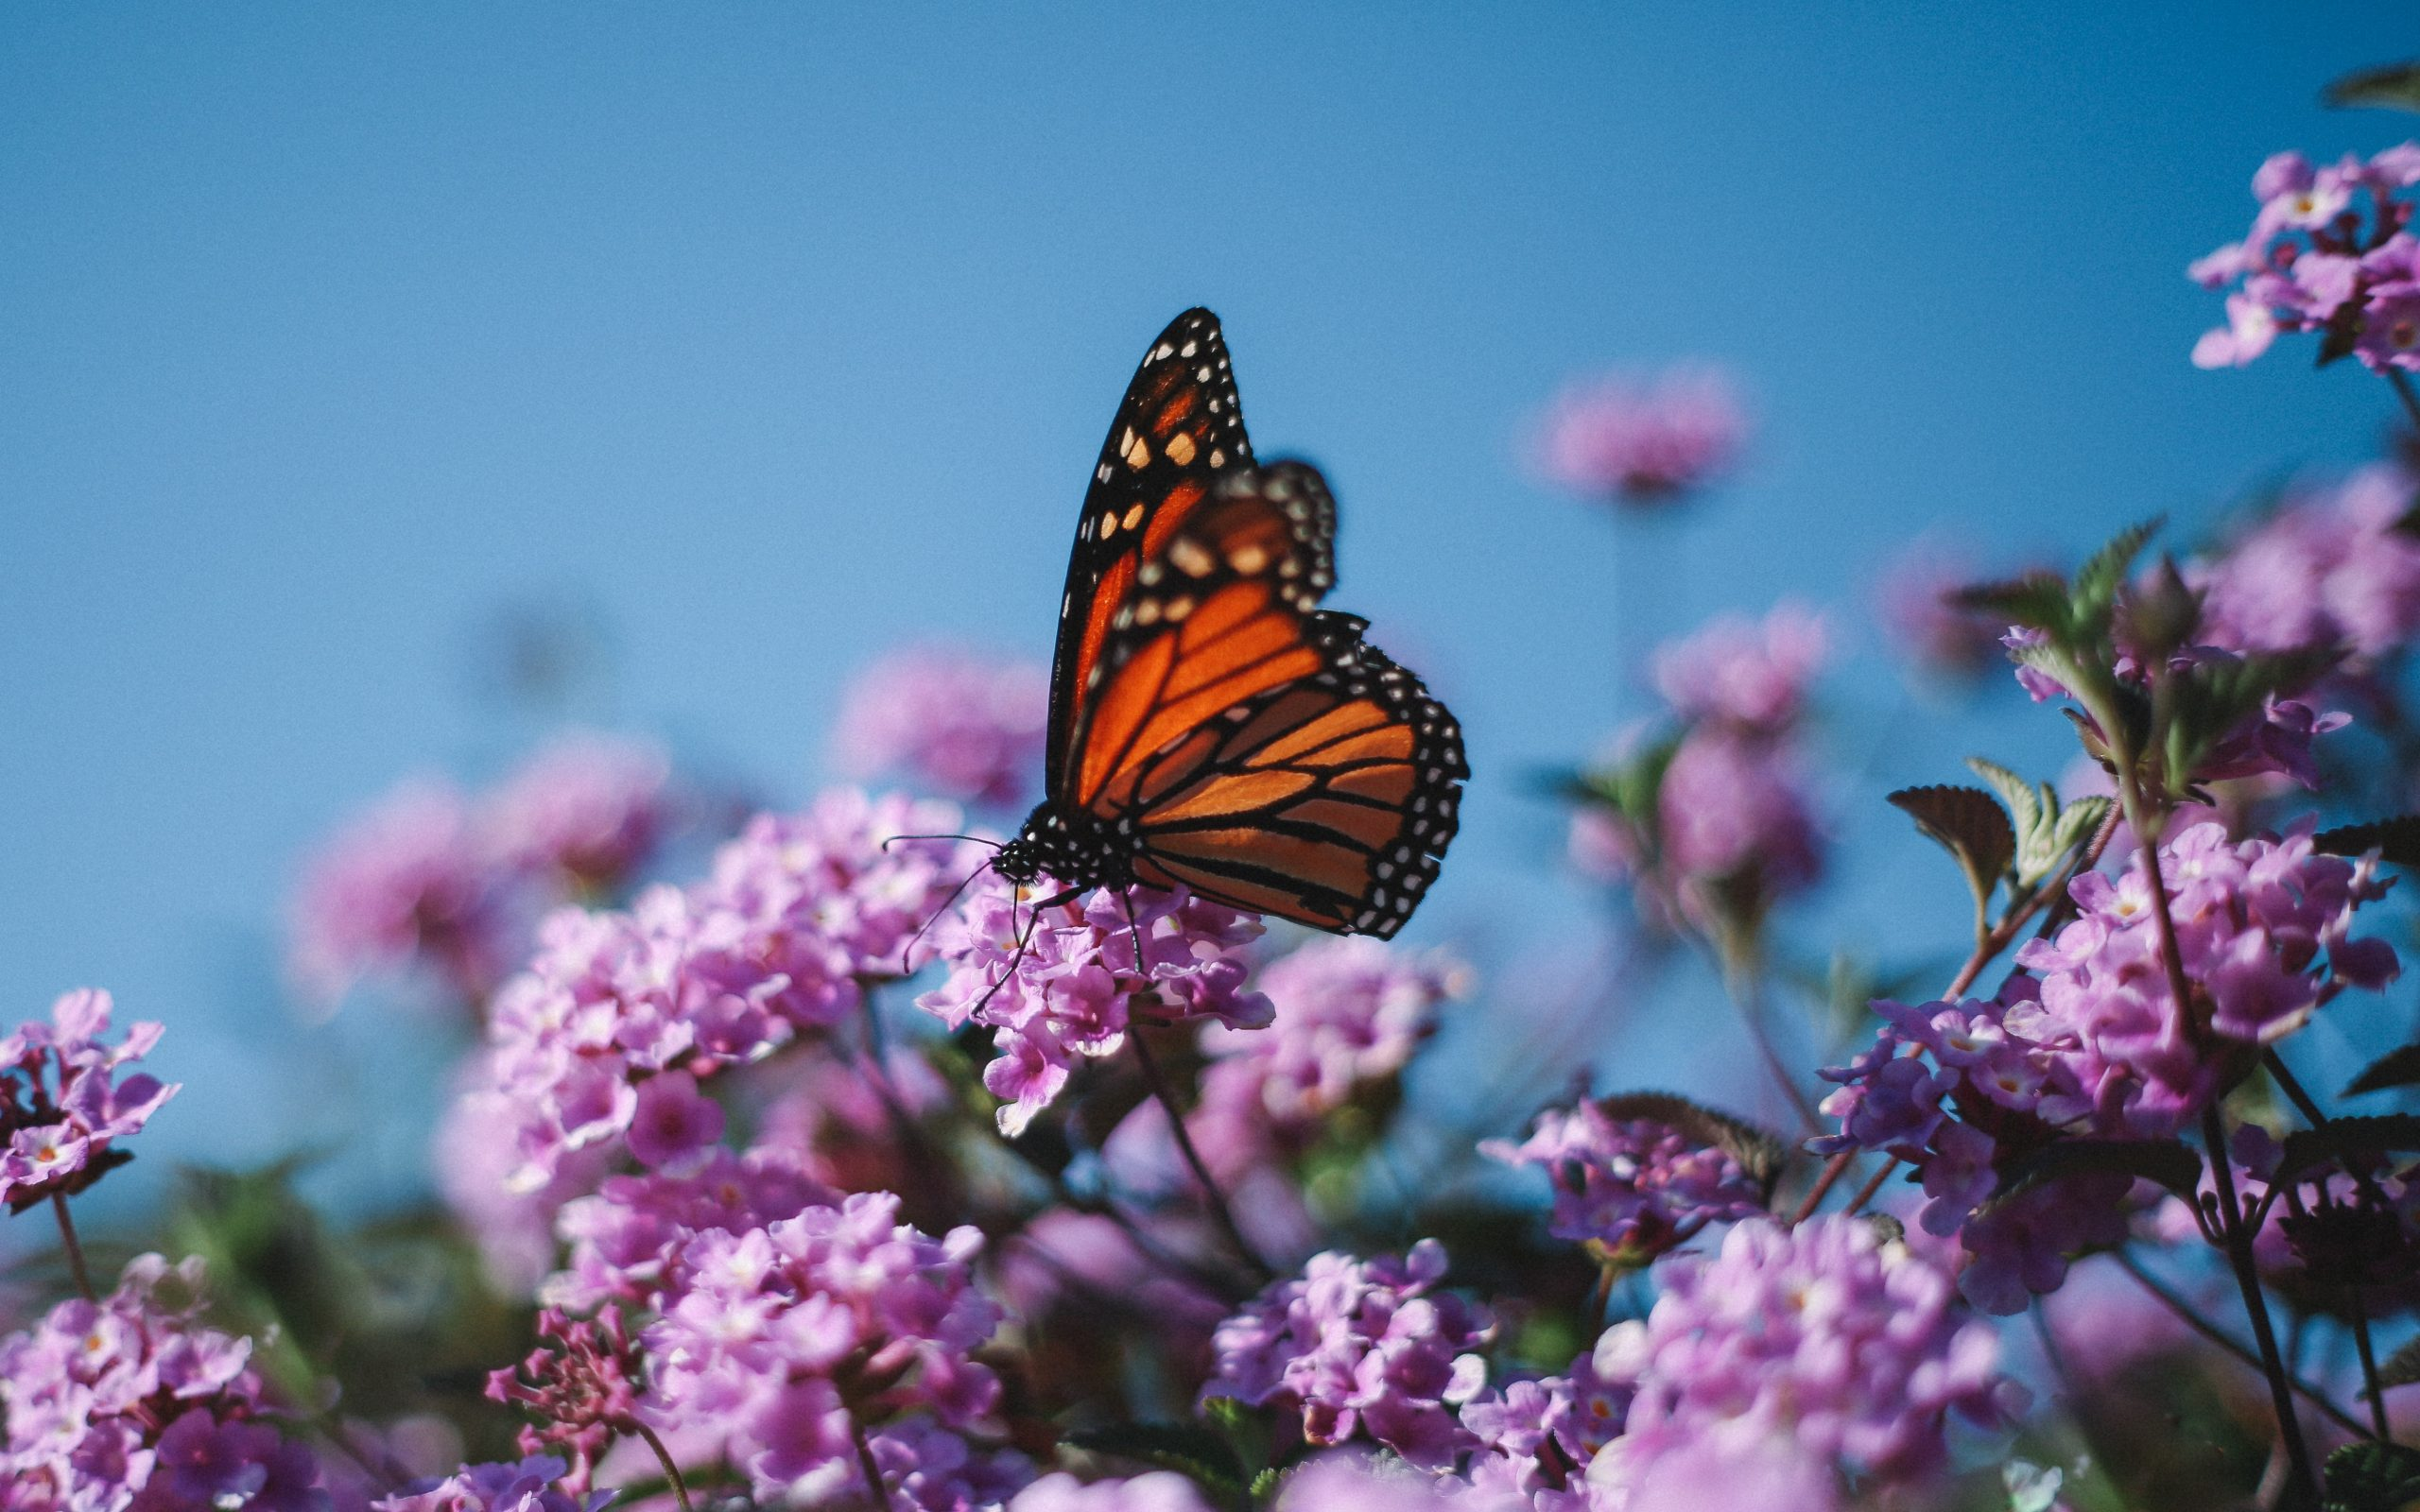 A red butterfly on purple flowers.